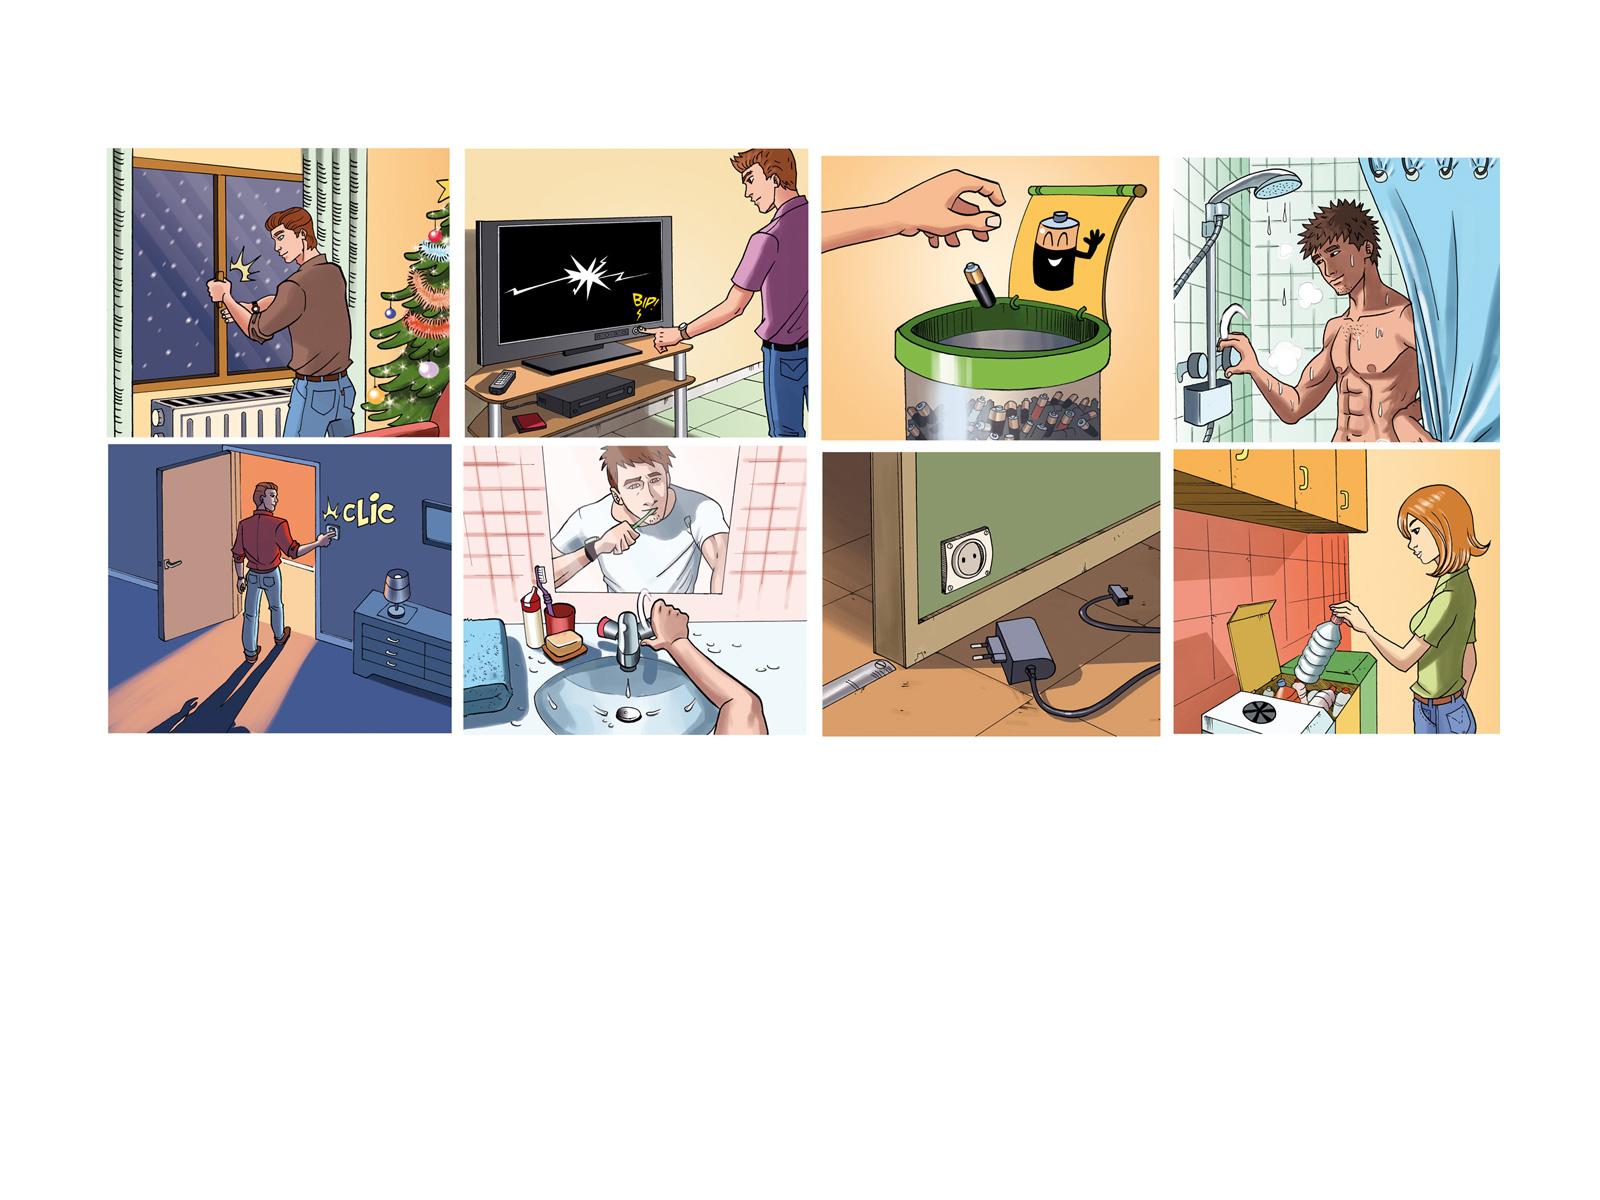 RECIOAlfonso-Illustrations-EDITIONS-2811